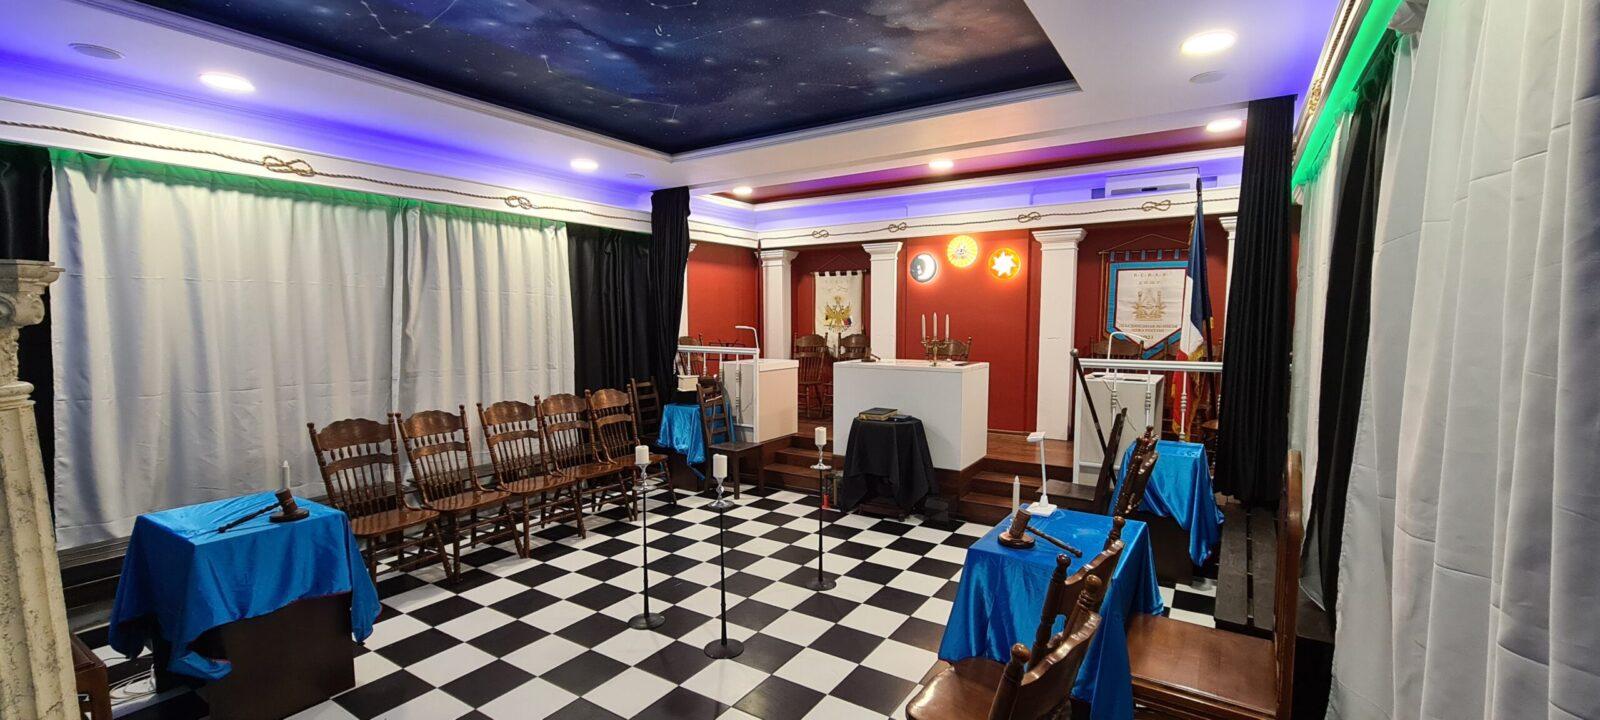 масонский храм ОВЛР